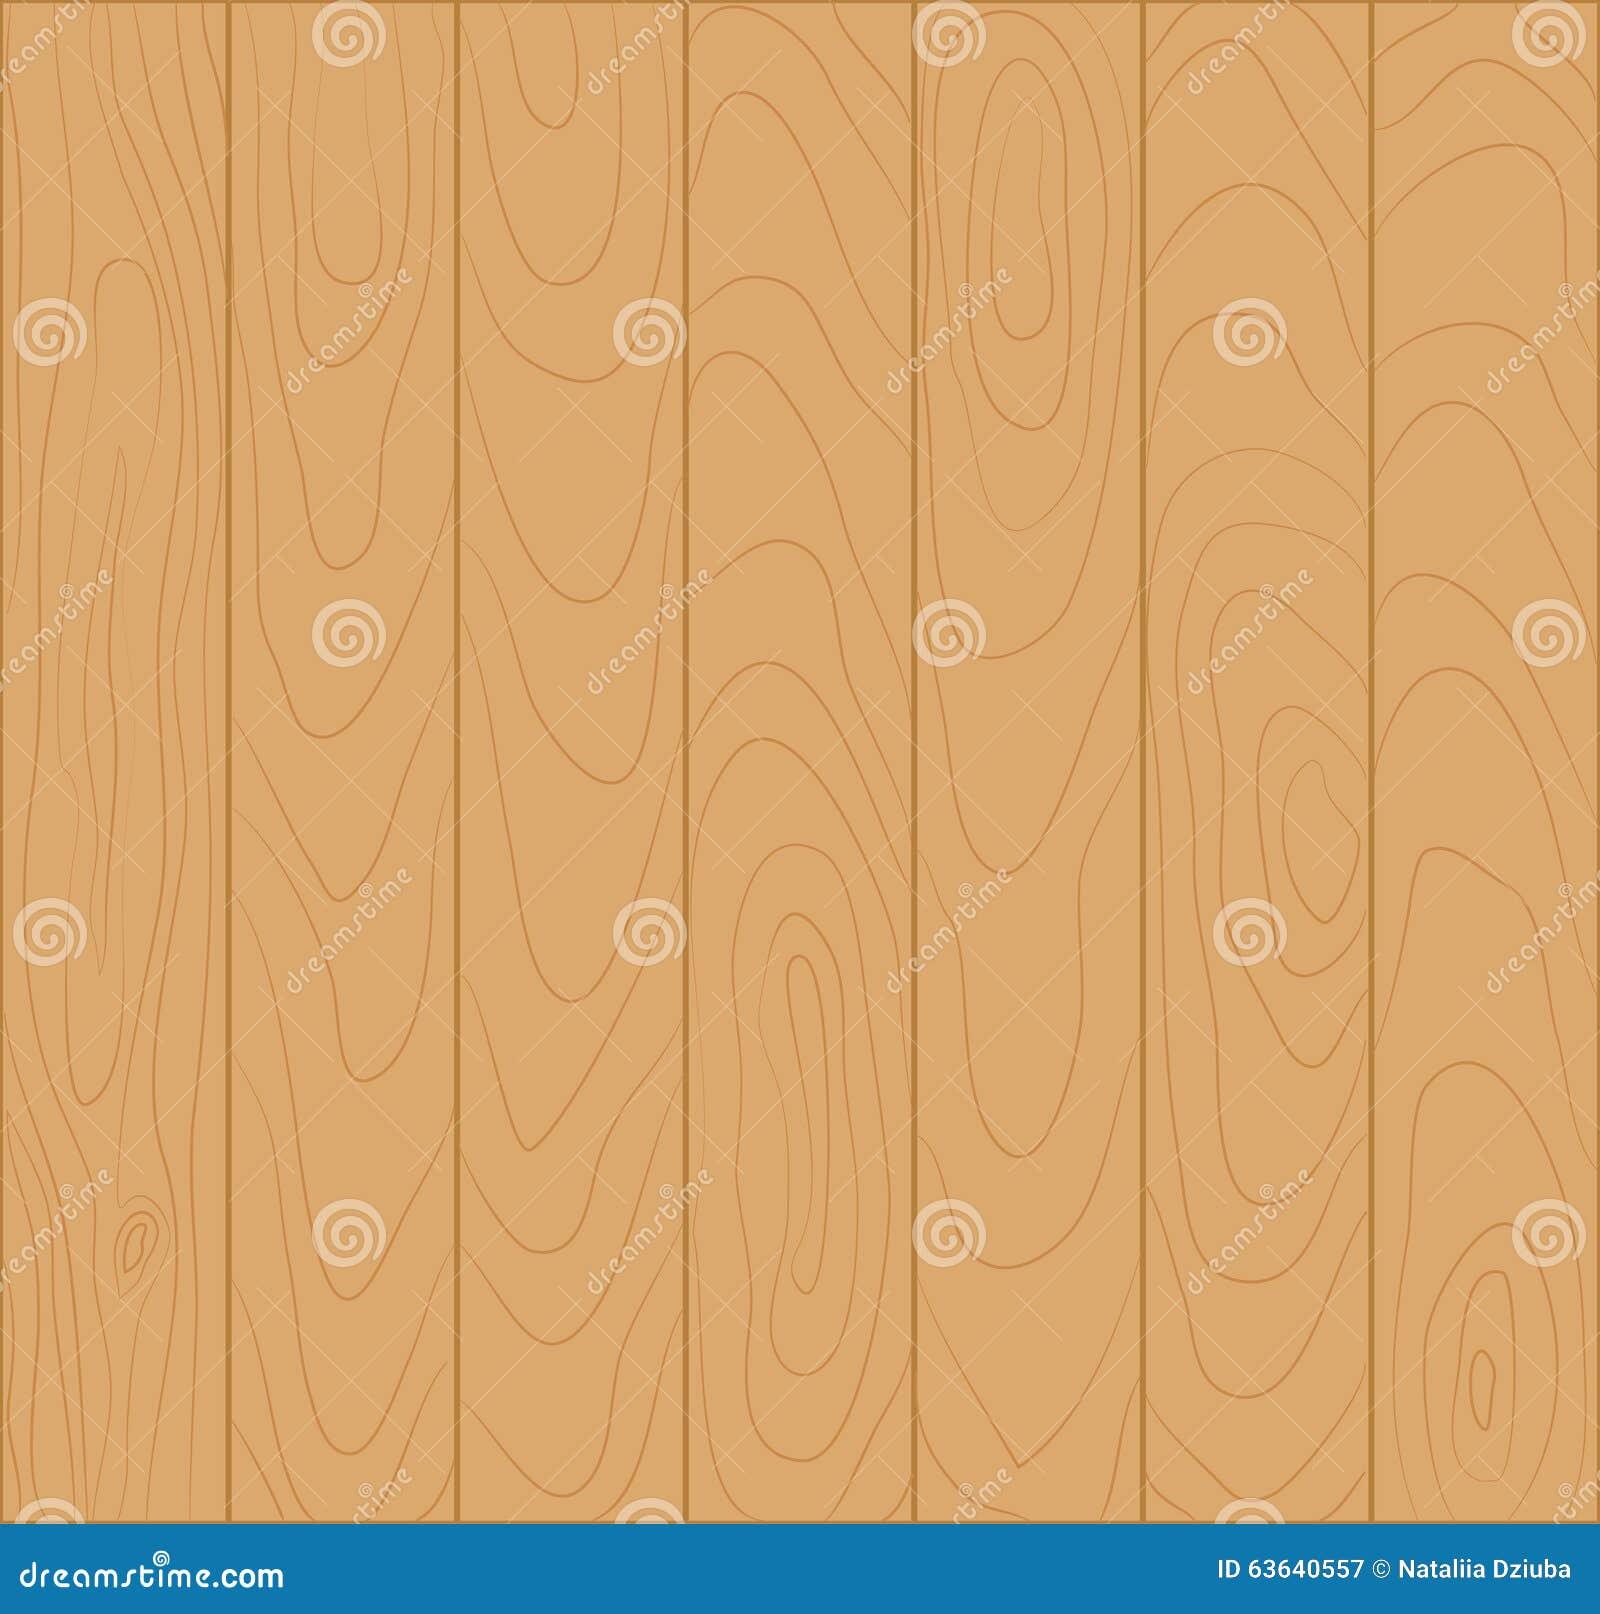 Painted Wood Texture Stock Illustration Illustration Of Surface